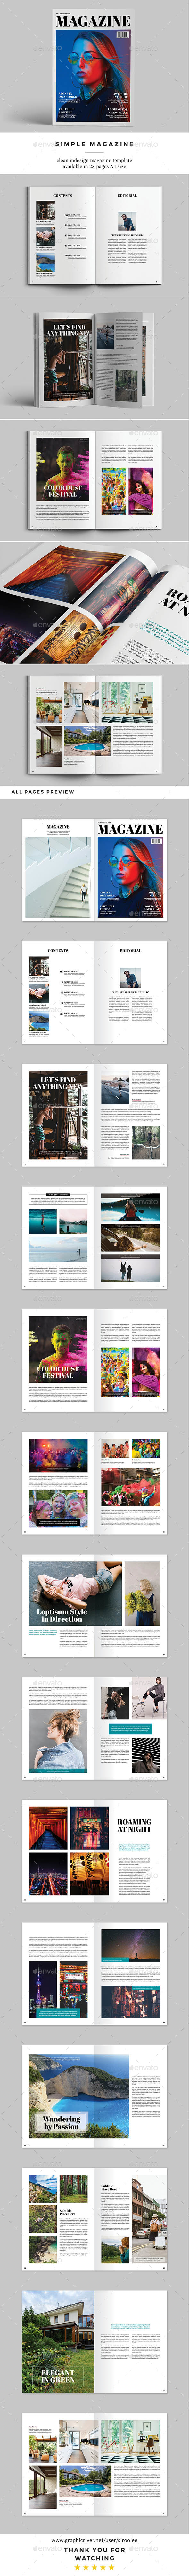 Simple Magazine - Magazines Print Templates